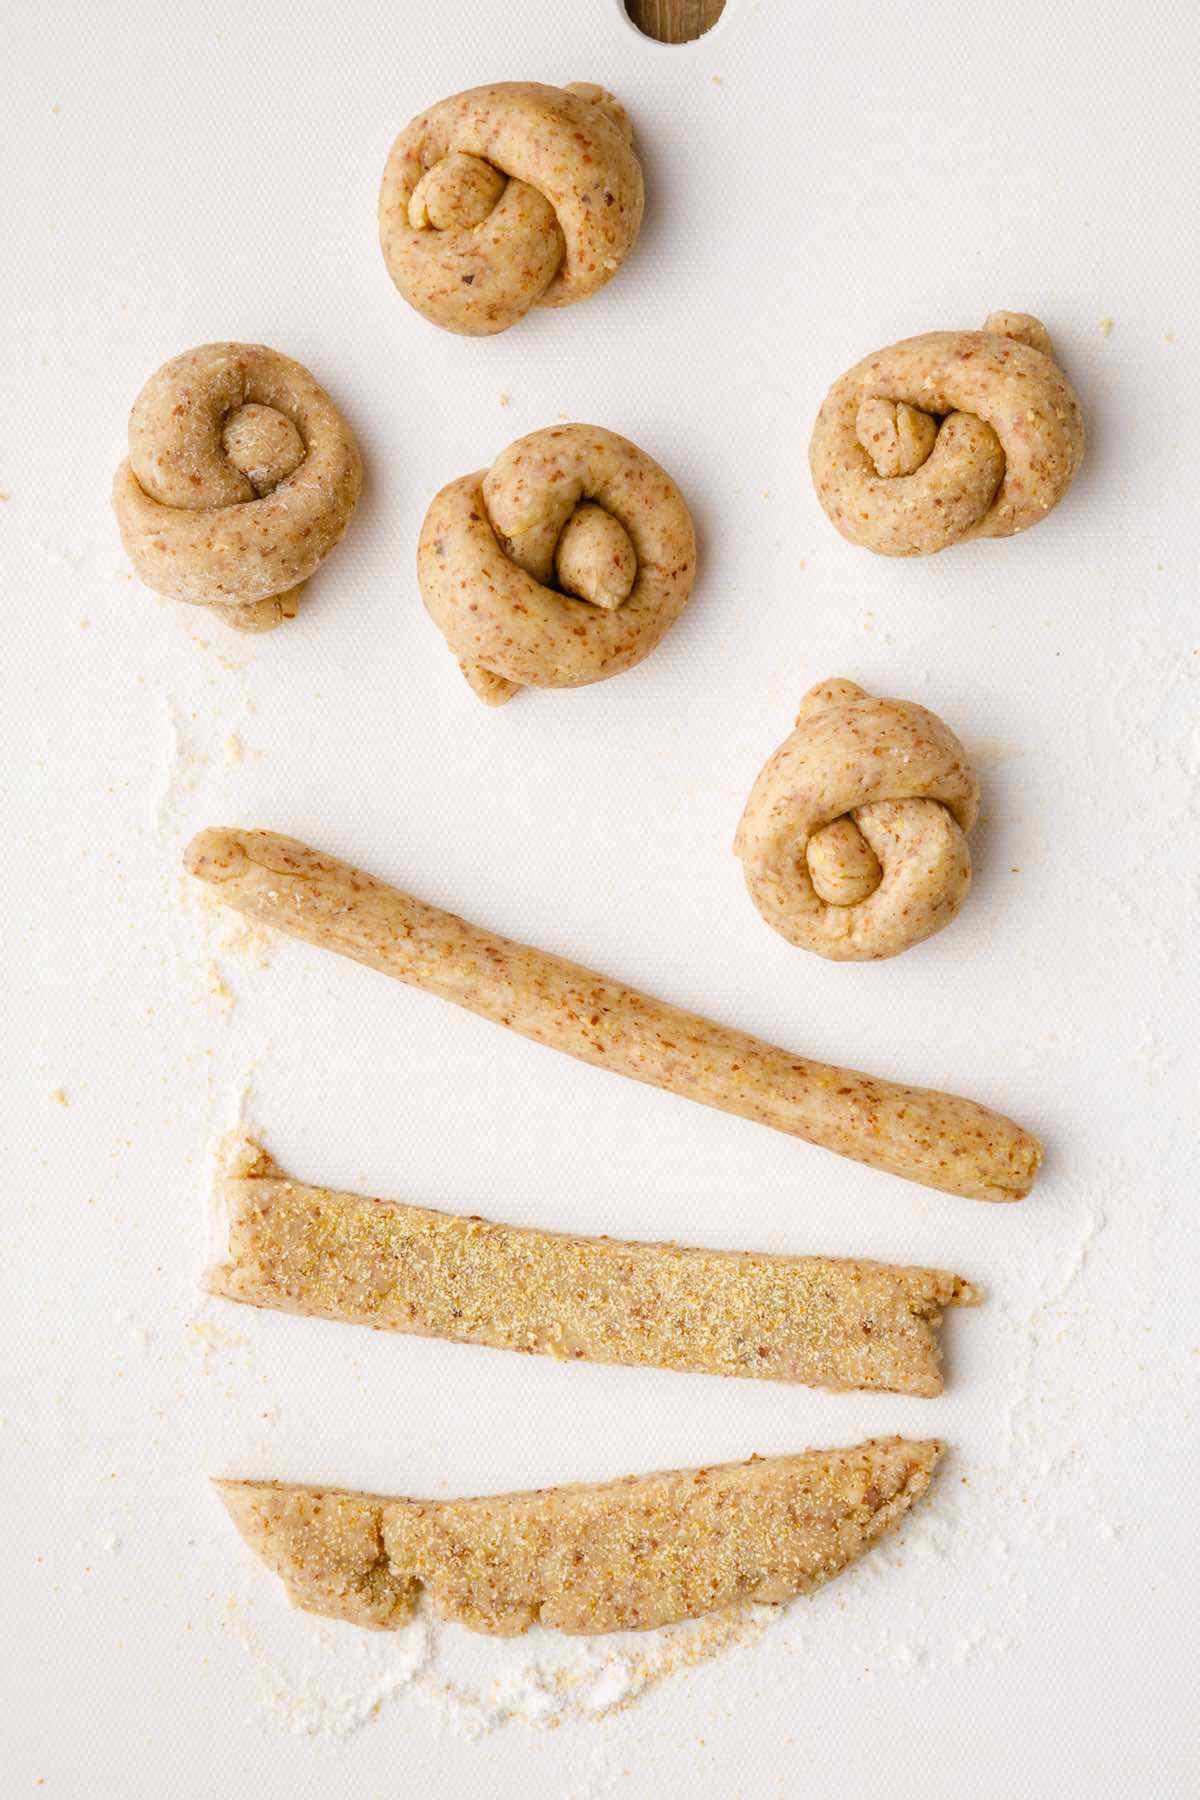 arrowroot flour dough prep